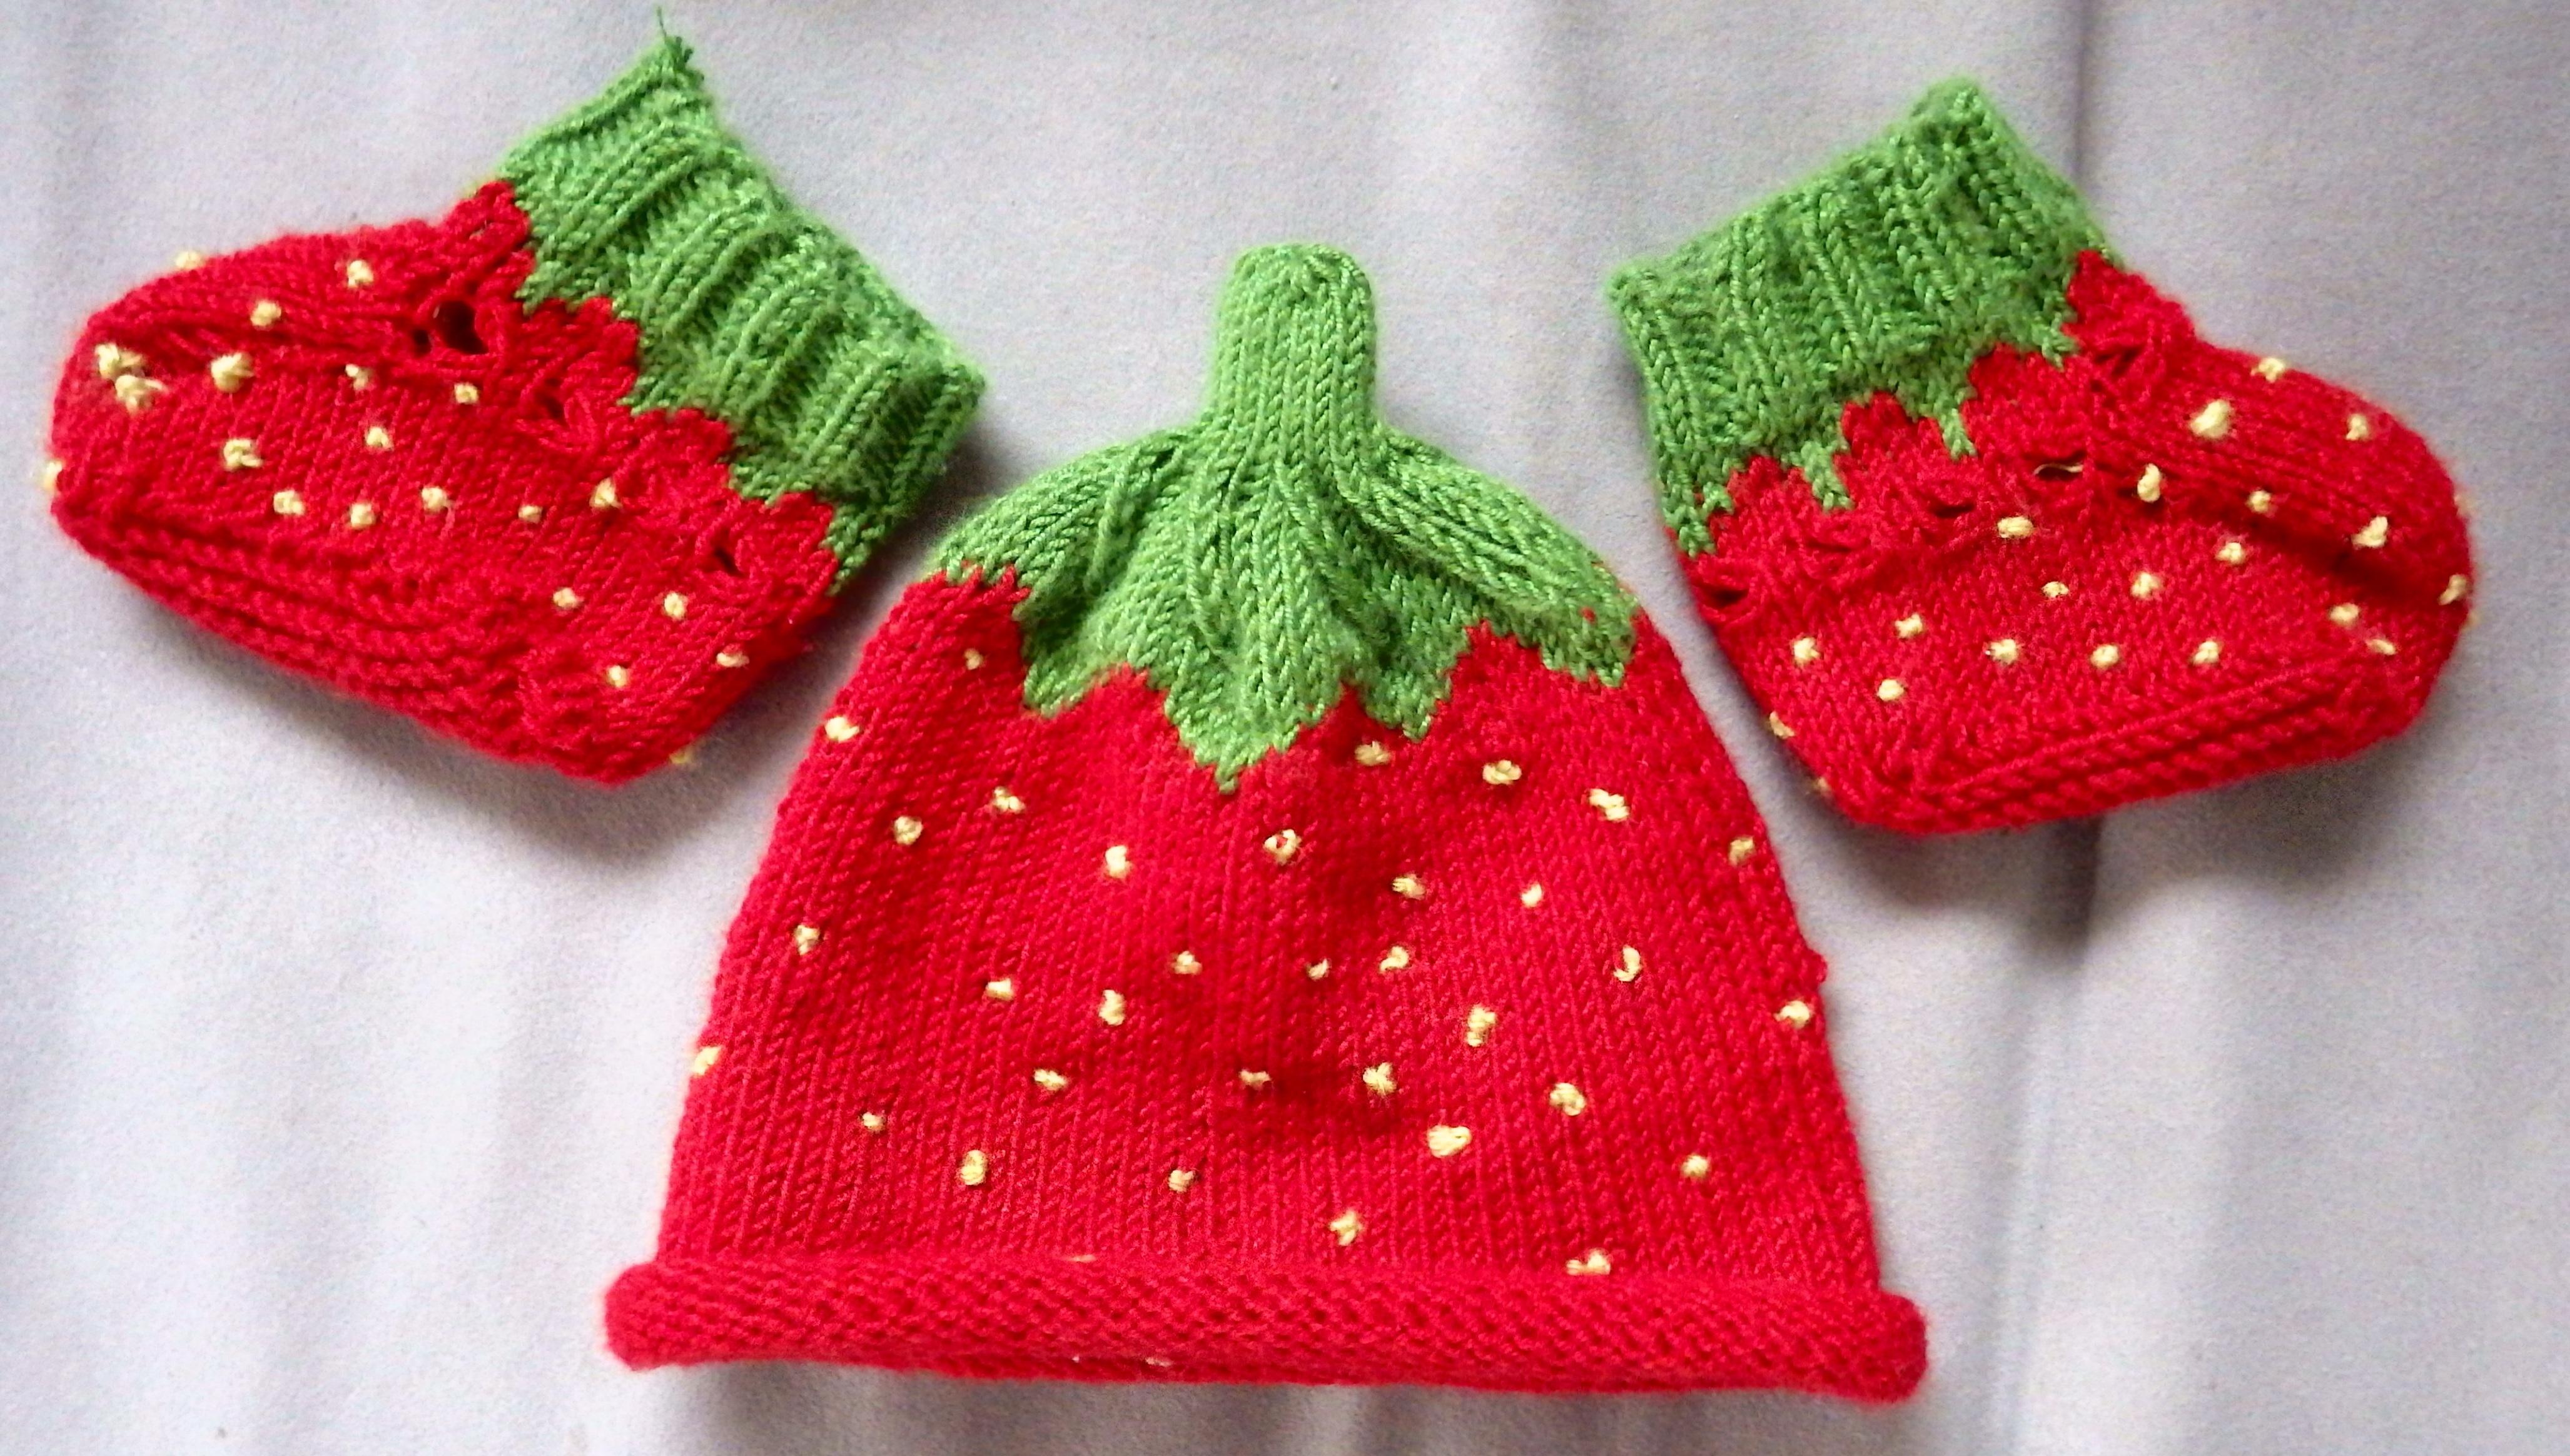 Fotos gratis : pétalo, patrón, rojo, ropa, bebé, Decoración navideña ...